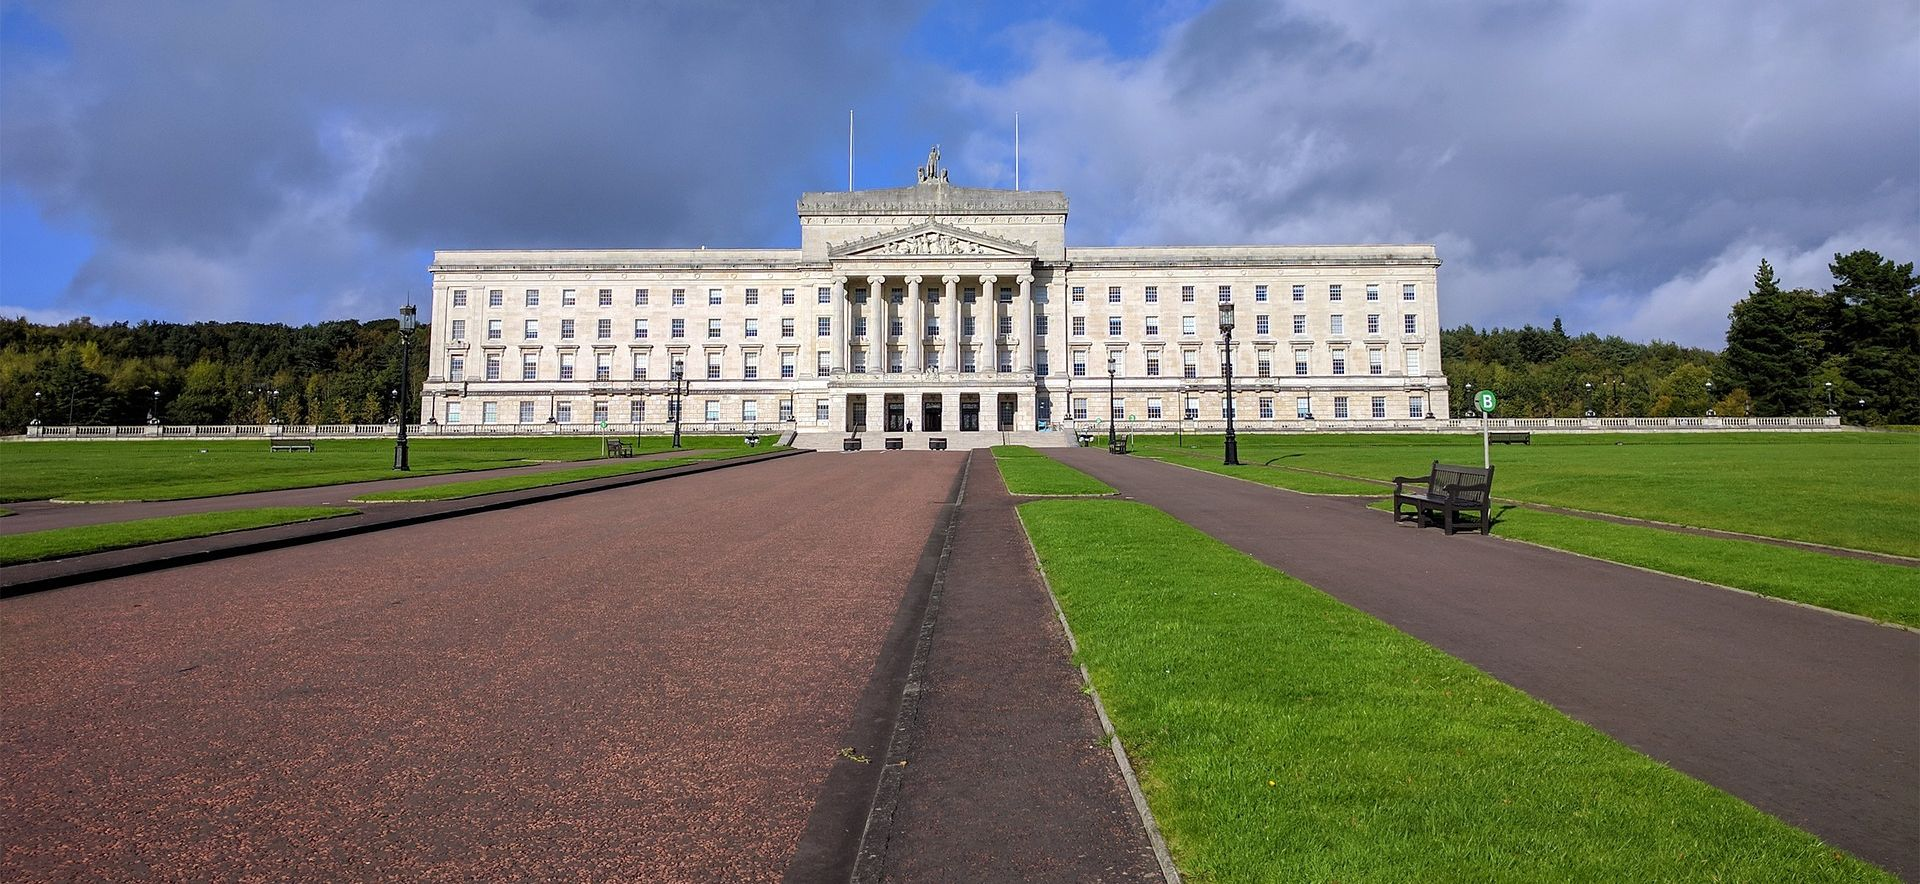 Umor, frustracija, zbunjenost: Glavobolje po brexitu u Sj. Irskoj